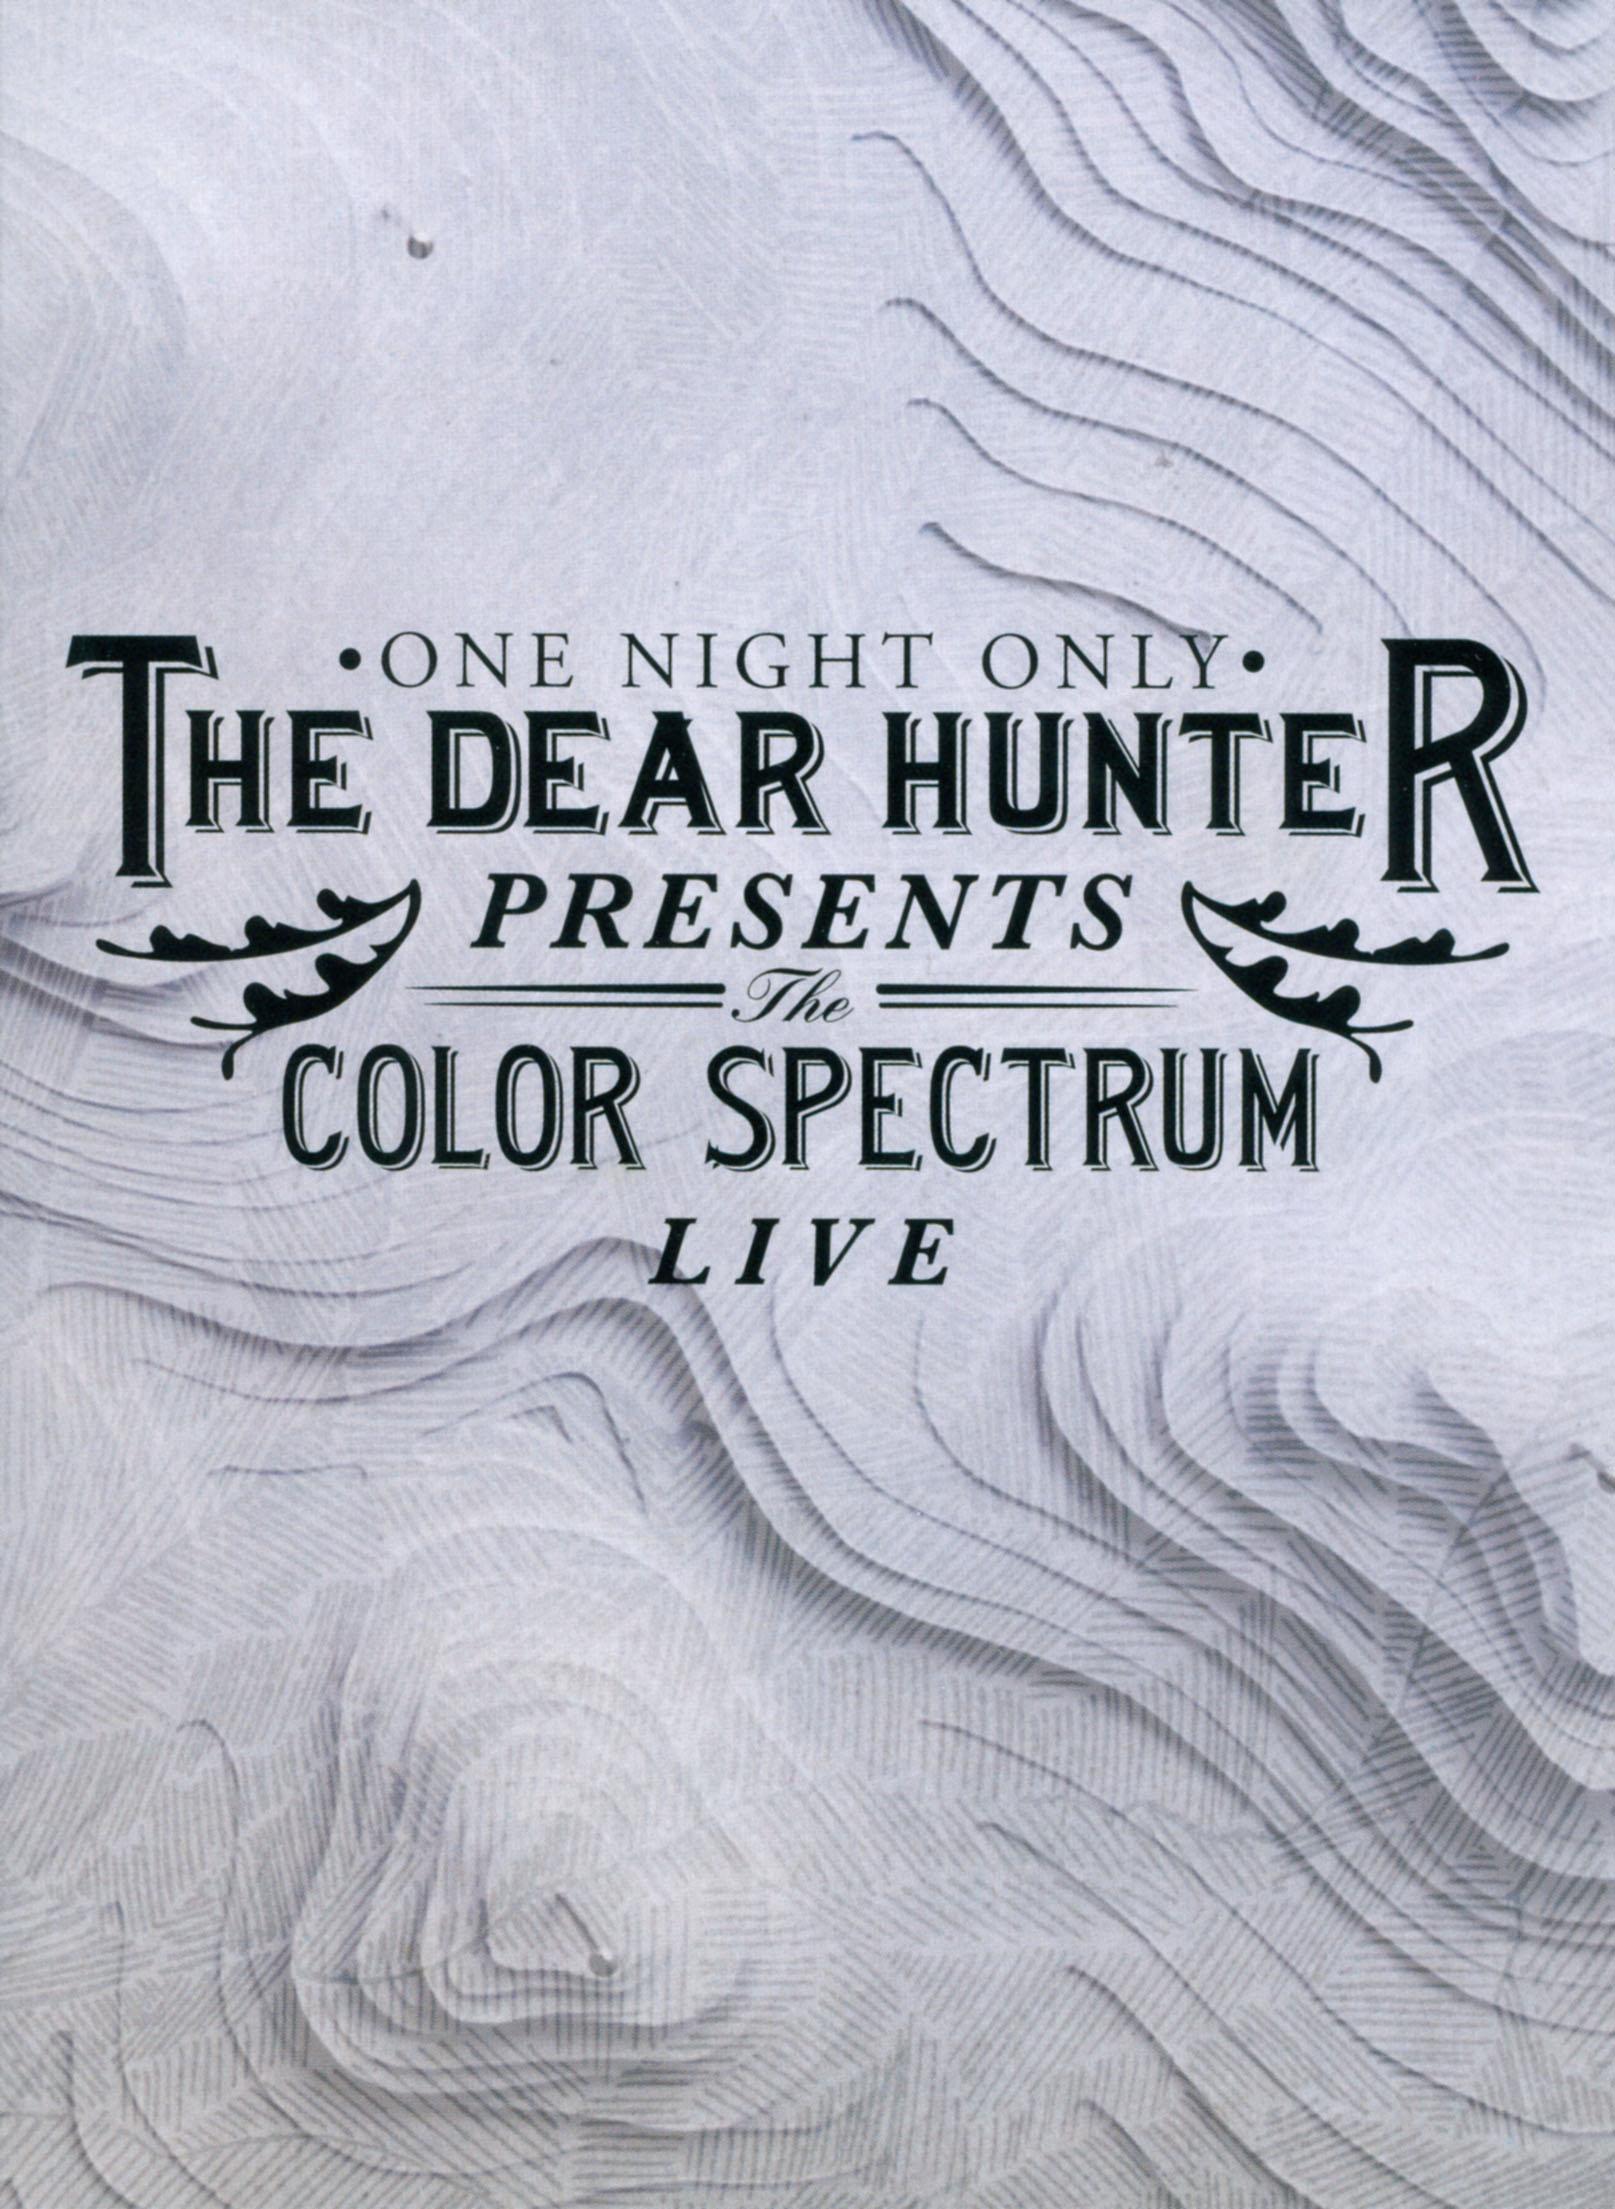 The Dear Hunter Presents: The Color Spectrum Live